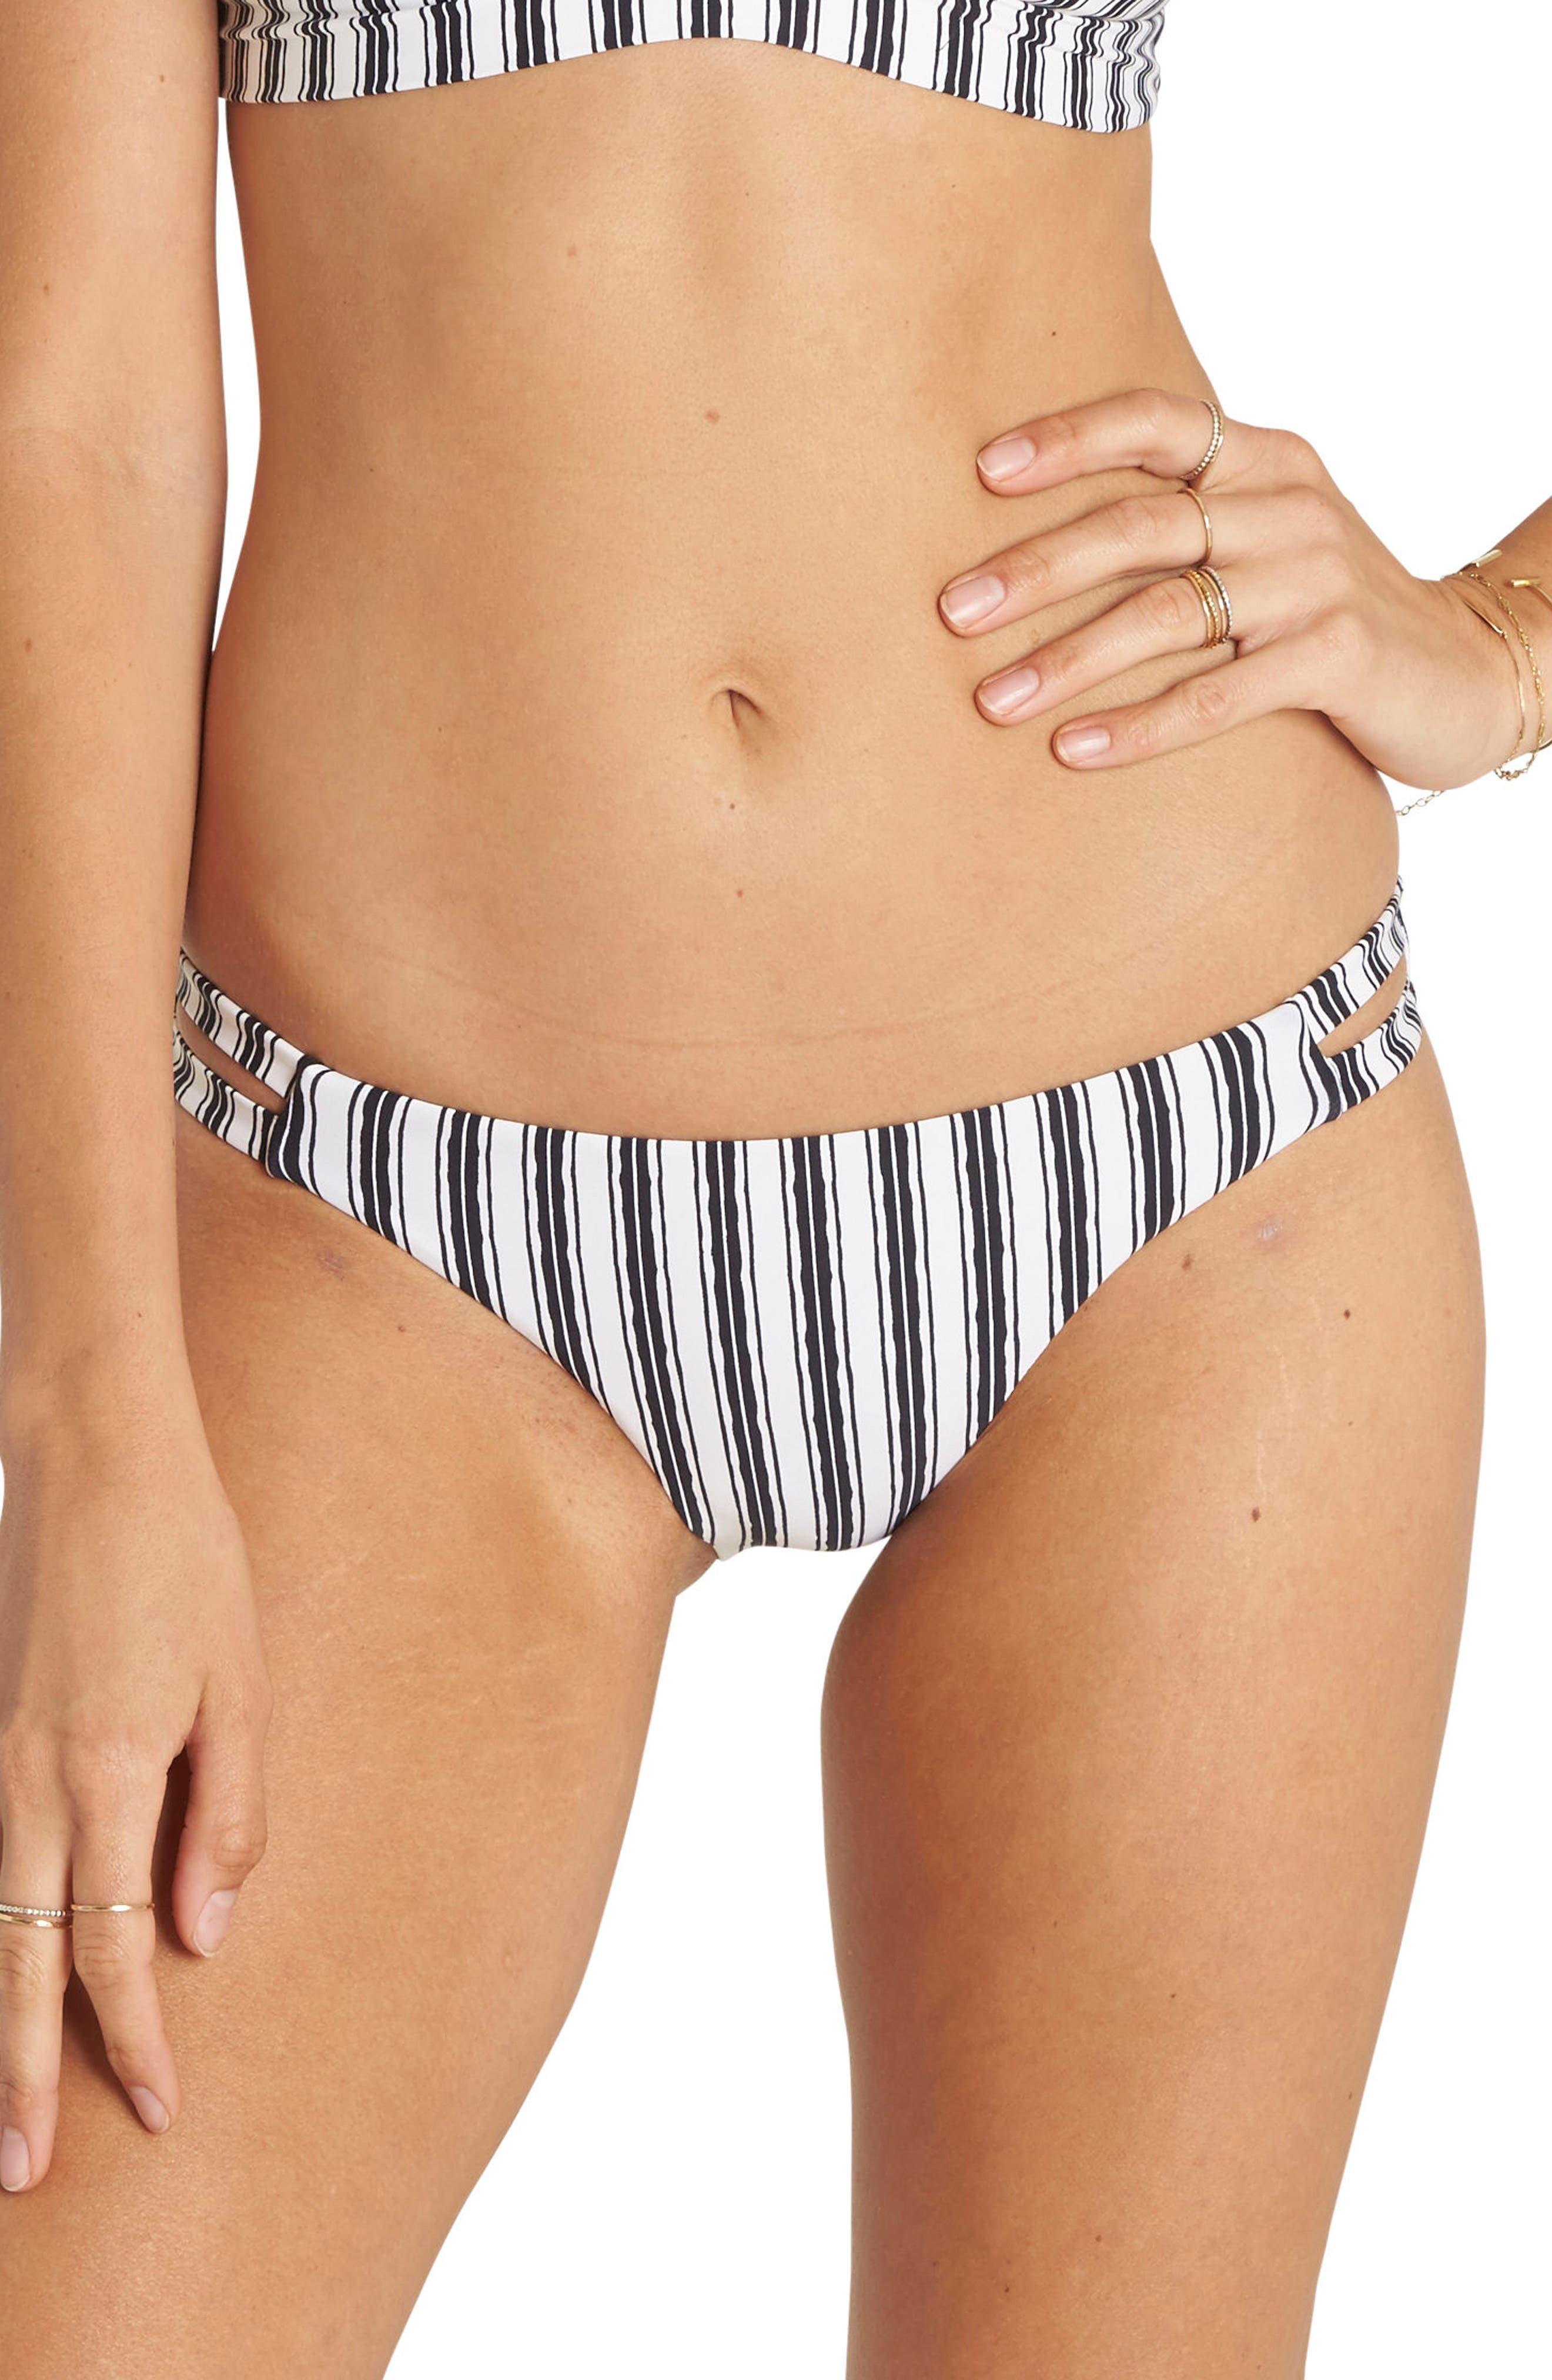 Get in Line Lowrider Bikini Bottoms,                             Main thumbnail 1, color,                             Multi